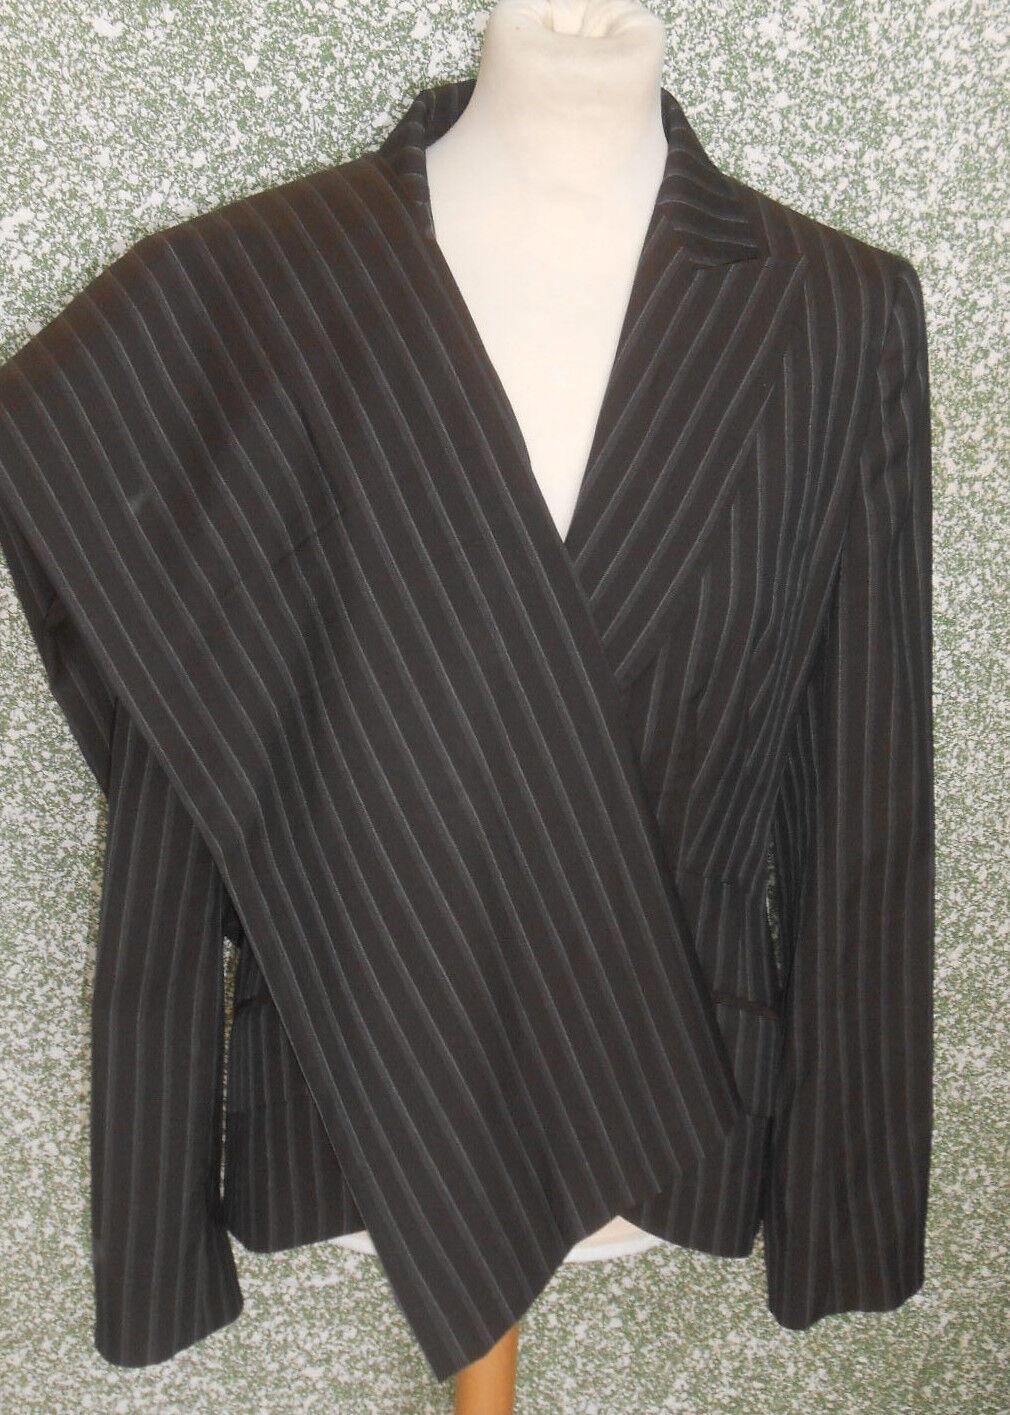 70 X1 Rene Lezard Pantaloni Completo Blazer + Tgl 38 brown Scuro Righe